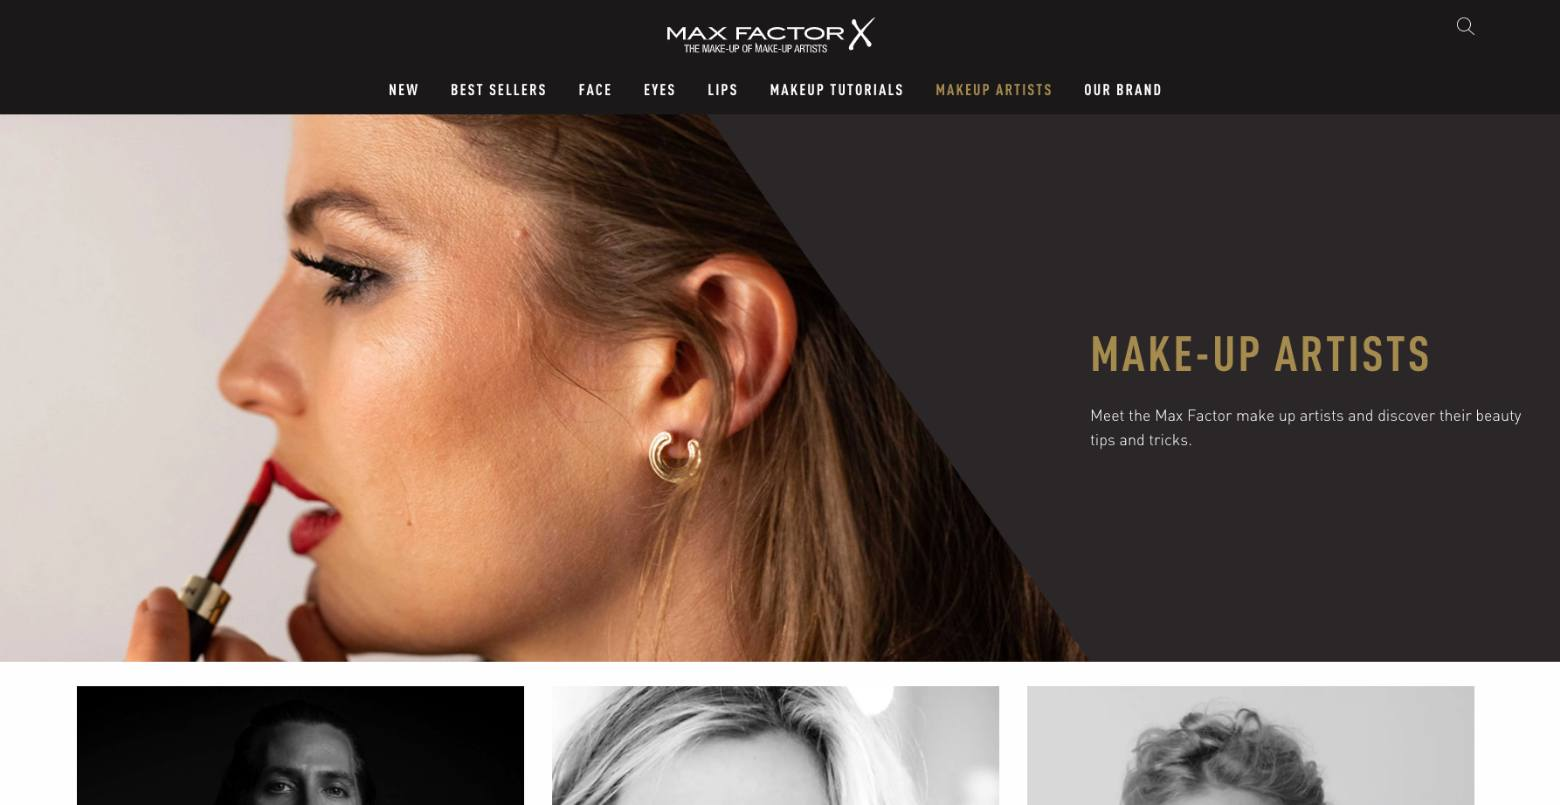 maxfactor social proof marketing